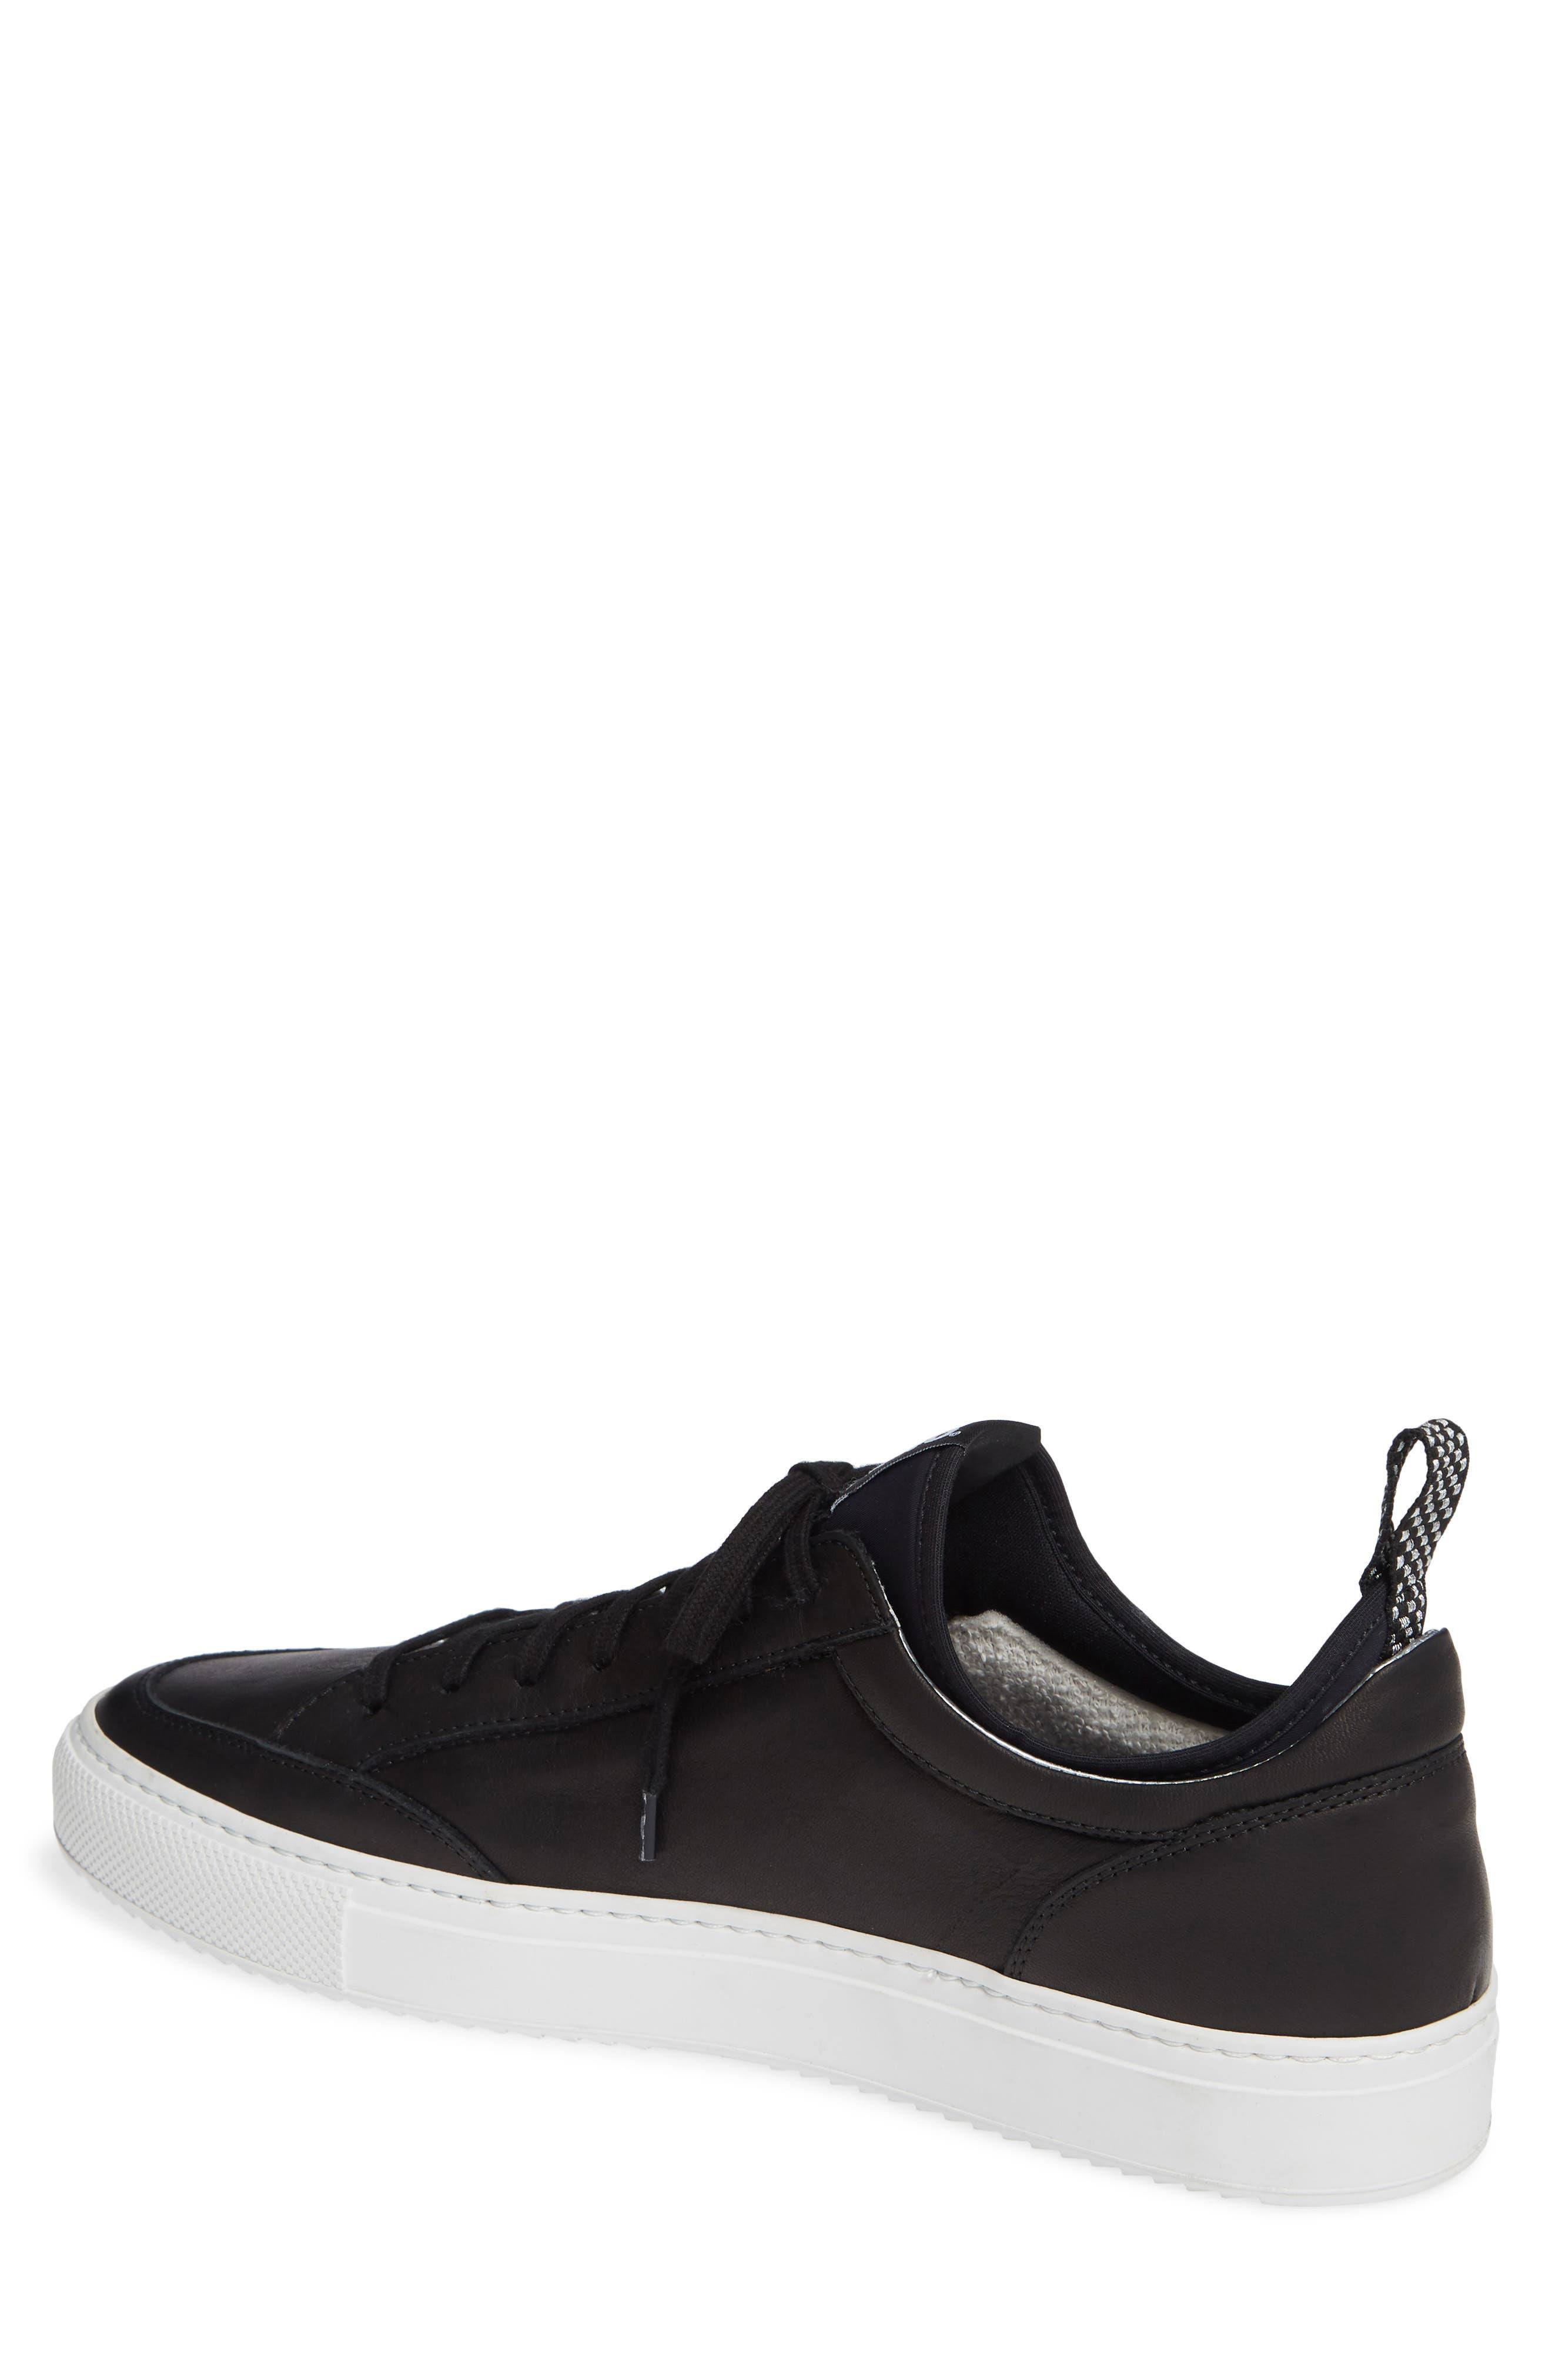 Absohosocks Sneaker,                             Alternate thumbnail 2, color,                             BLACK